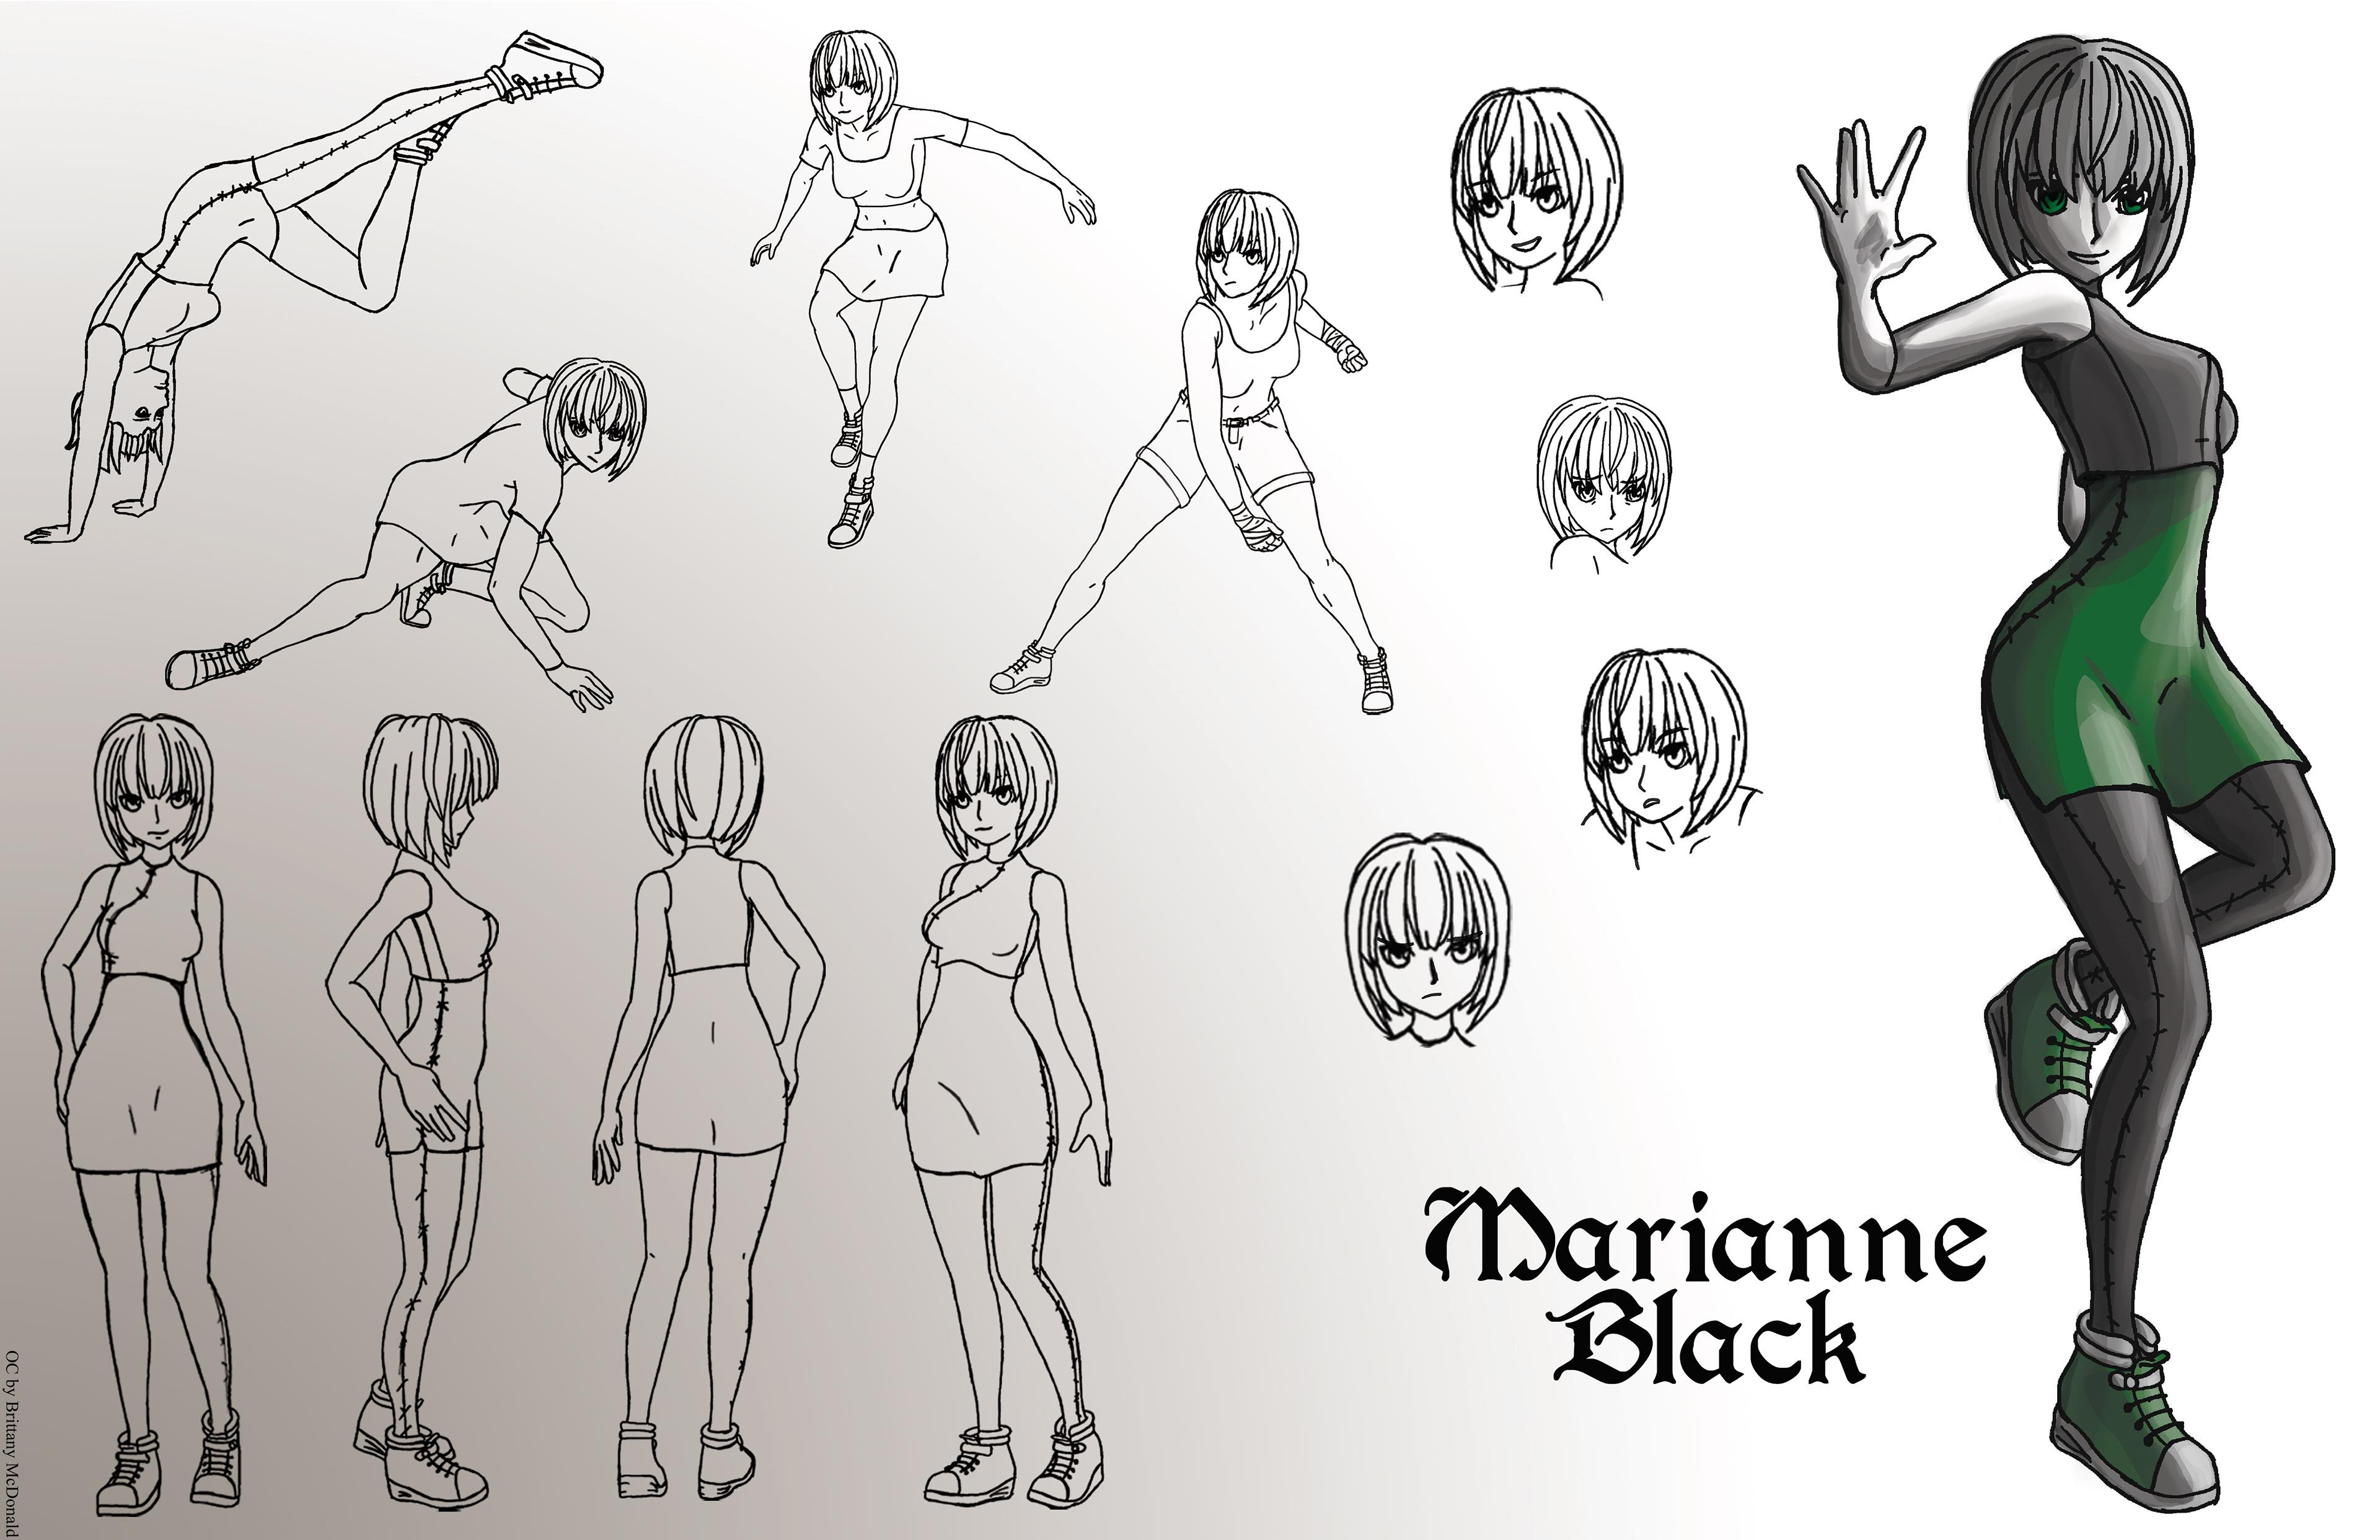 Marianne Black